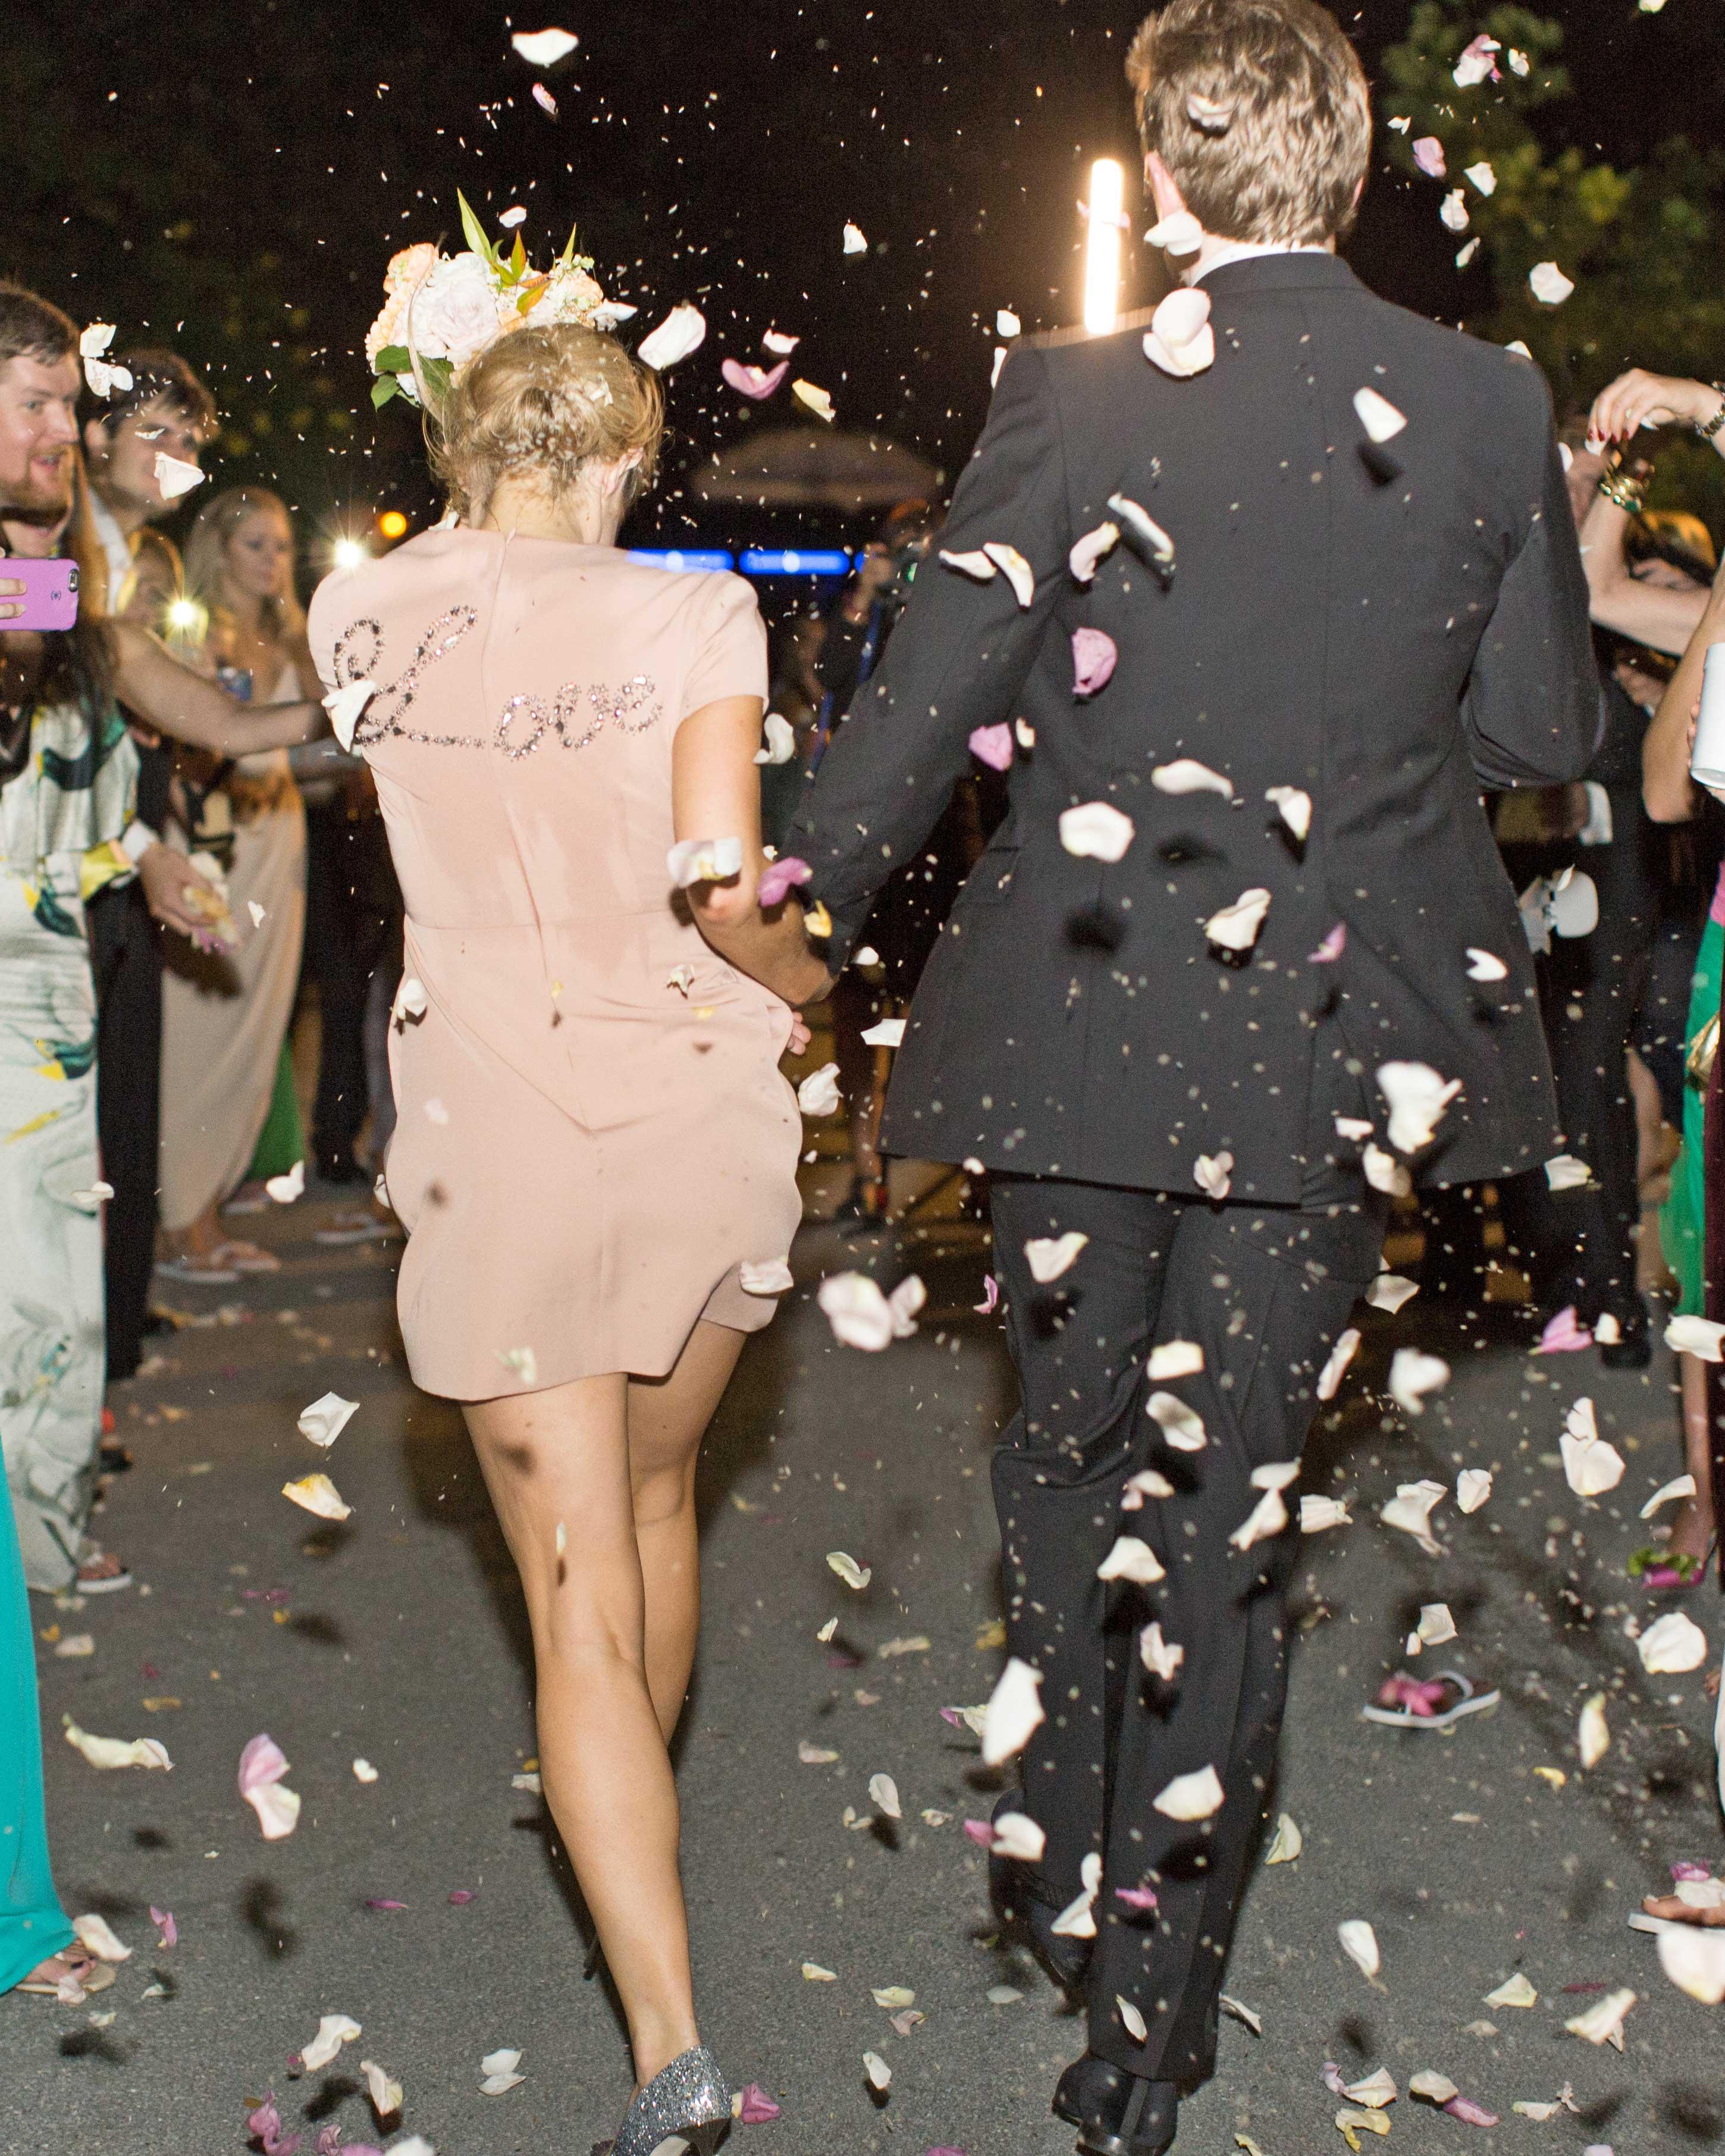 natalie jamey wedding sendoff confetti